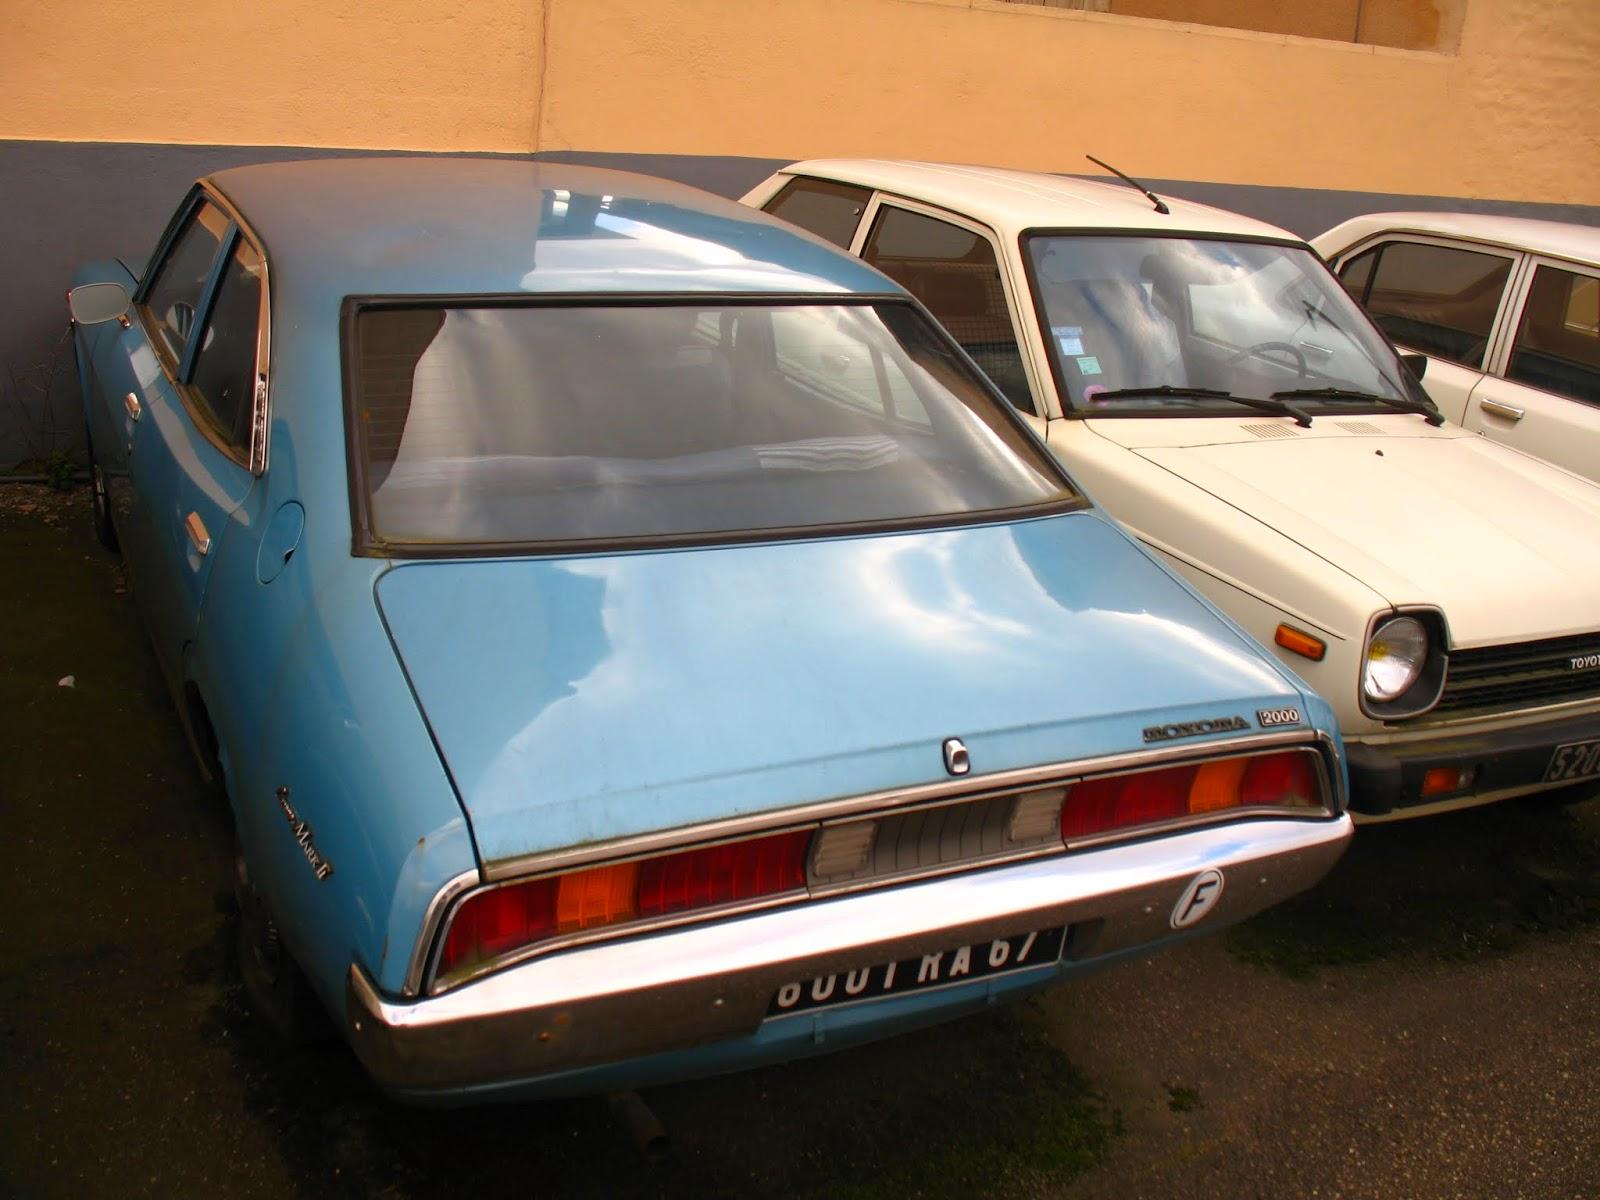 1971 1973 Toyota Corona Mark 2 2000 Sedan France 6